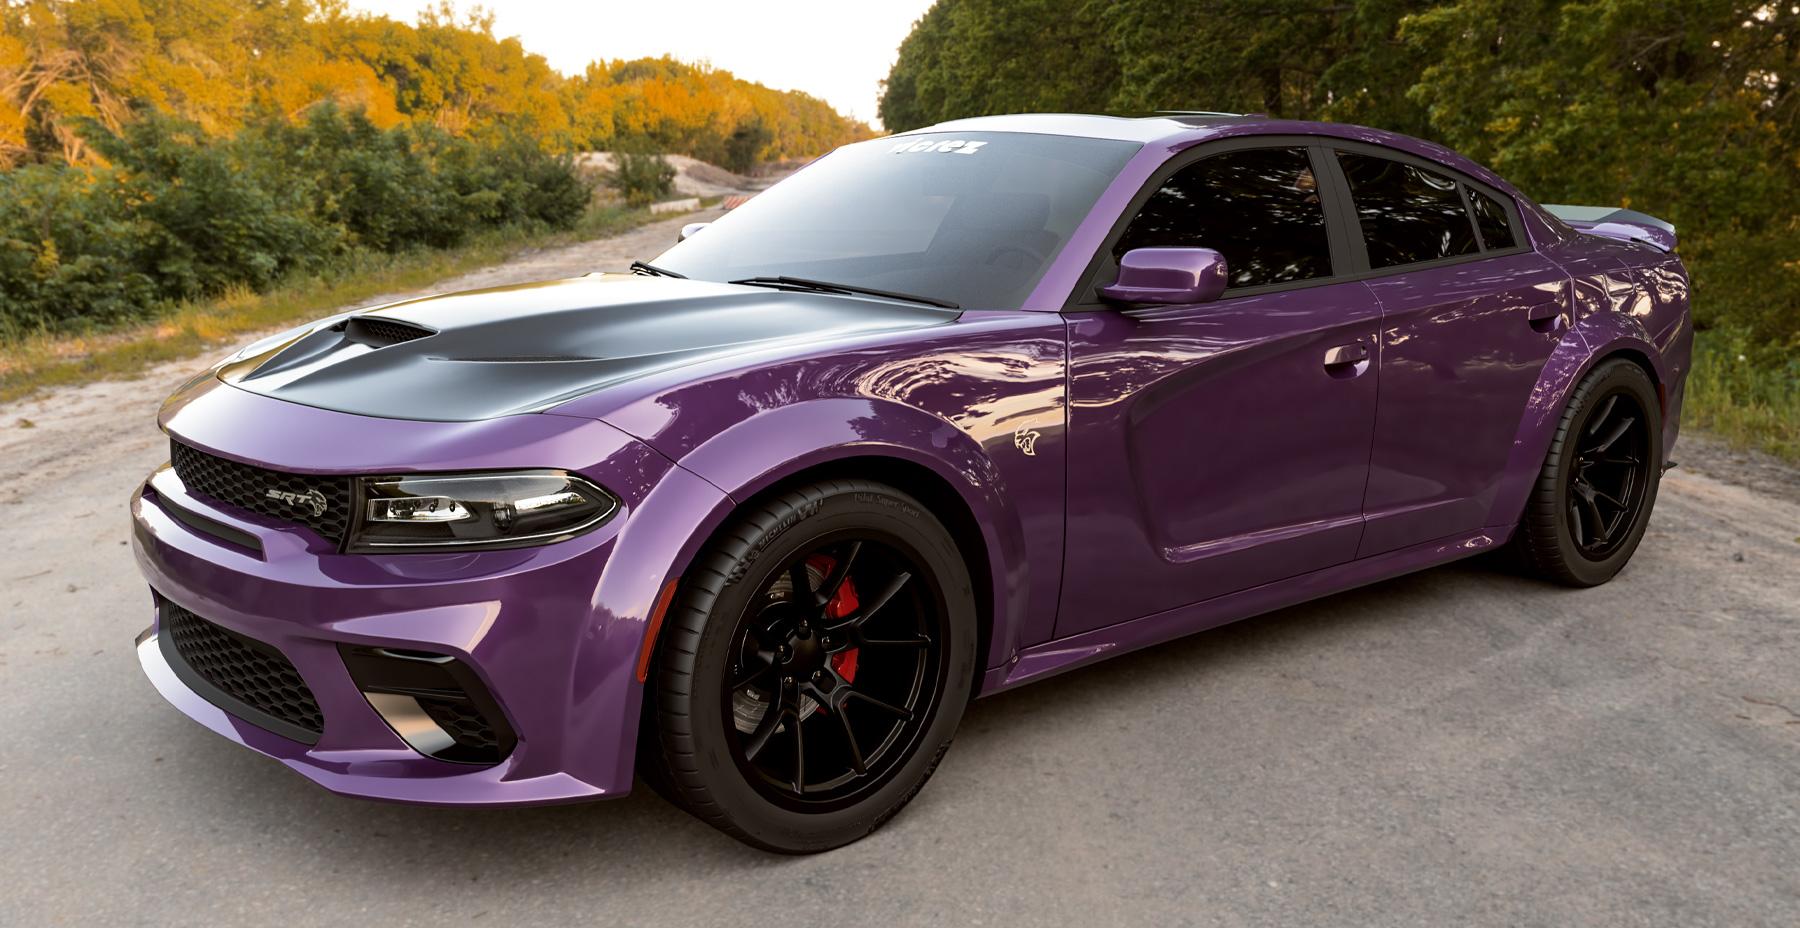 Purple Dodge Charger Widebody x Redeye Demon Style Matte Black Wheel